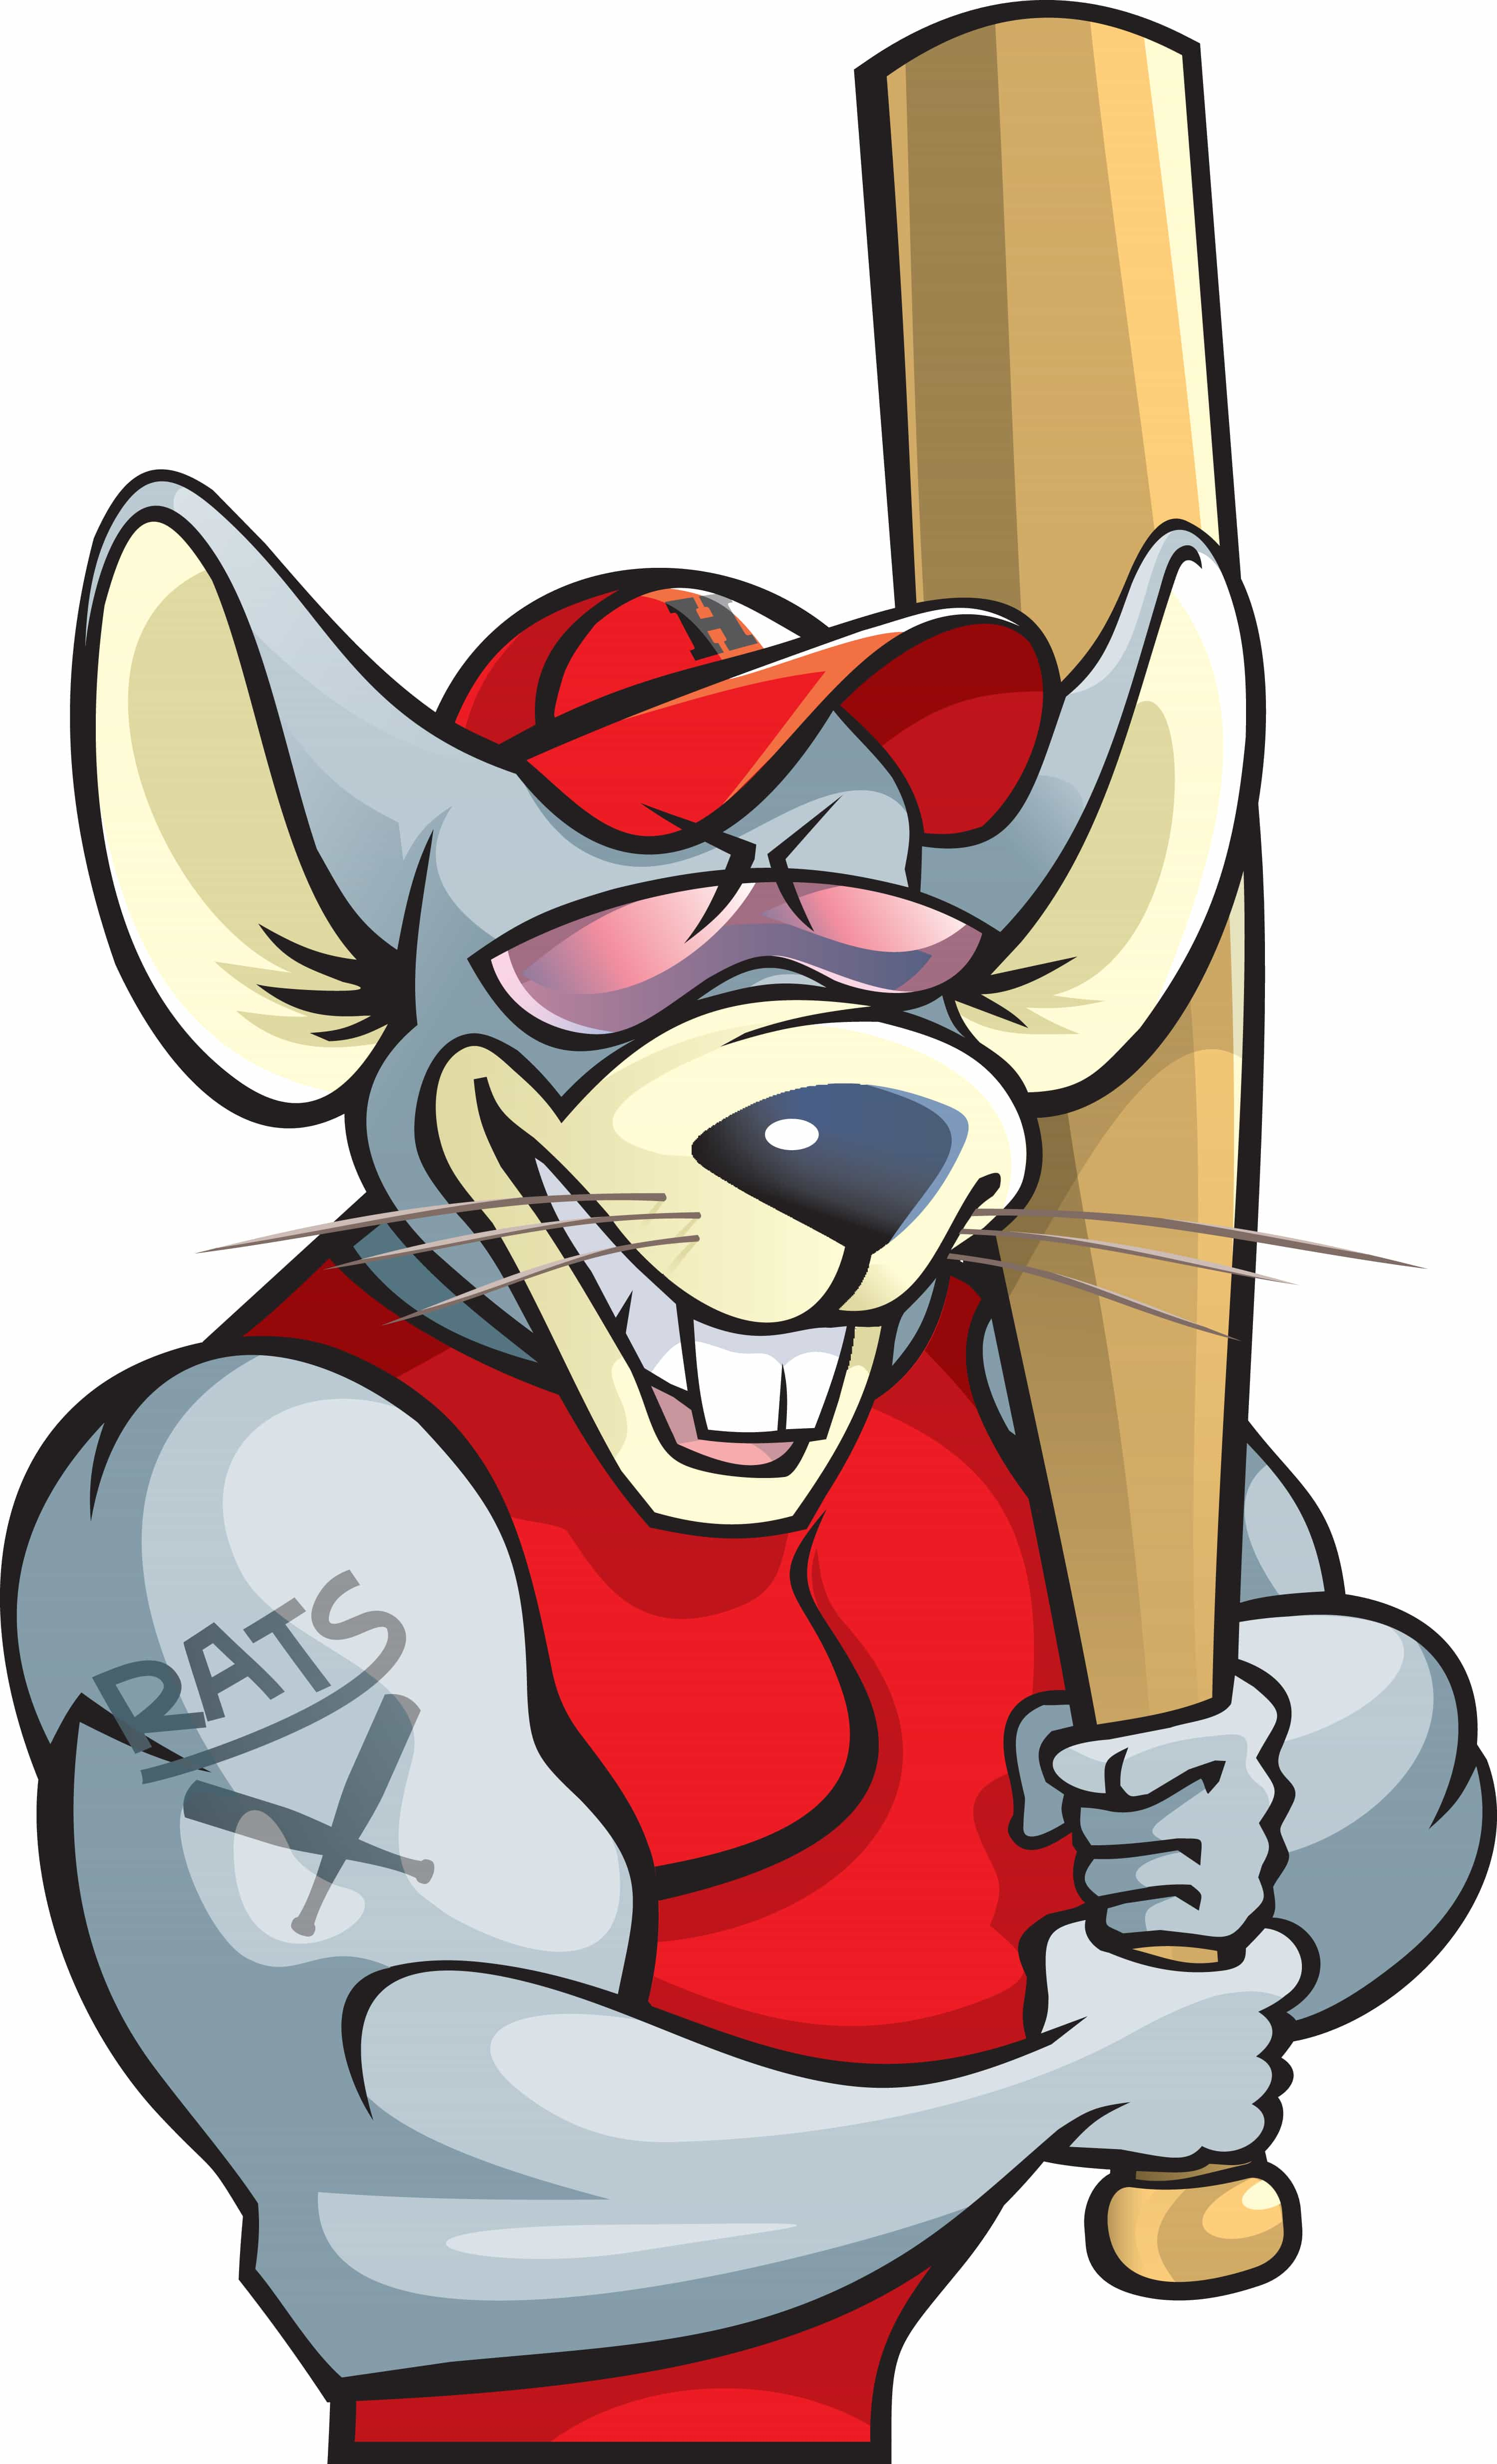 Baseball_Rat